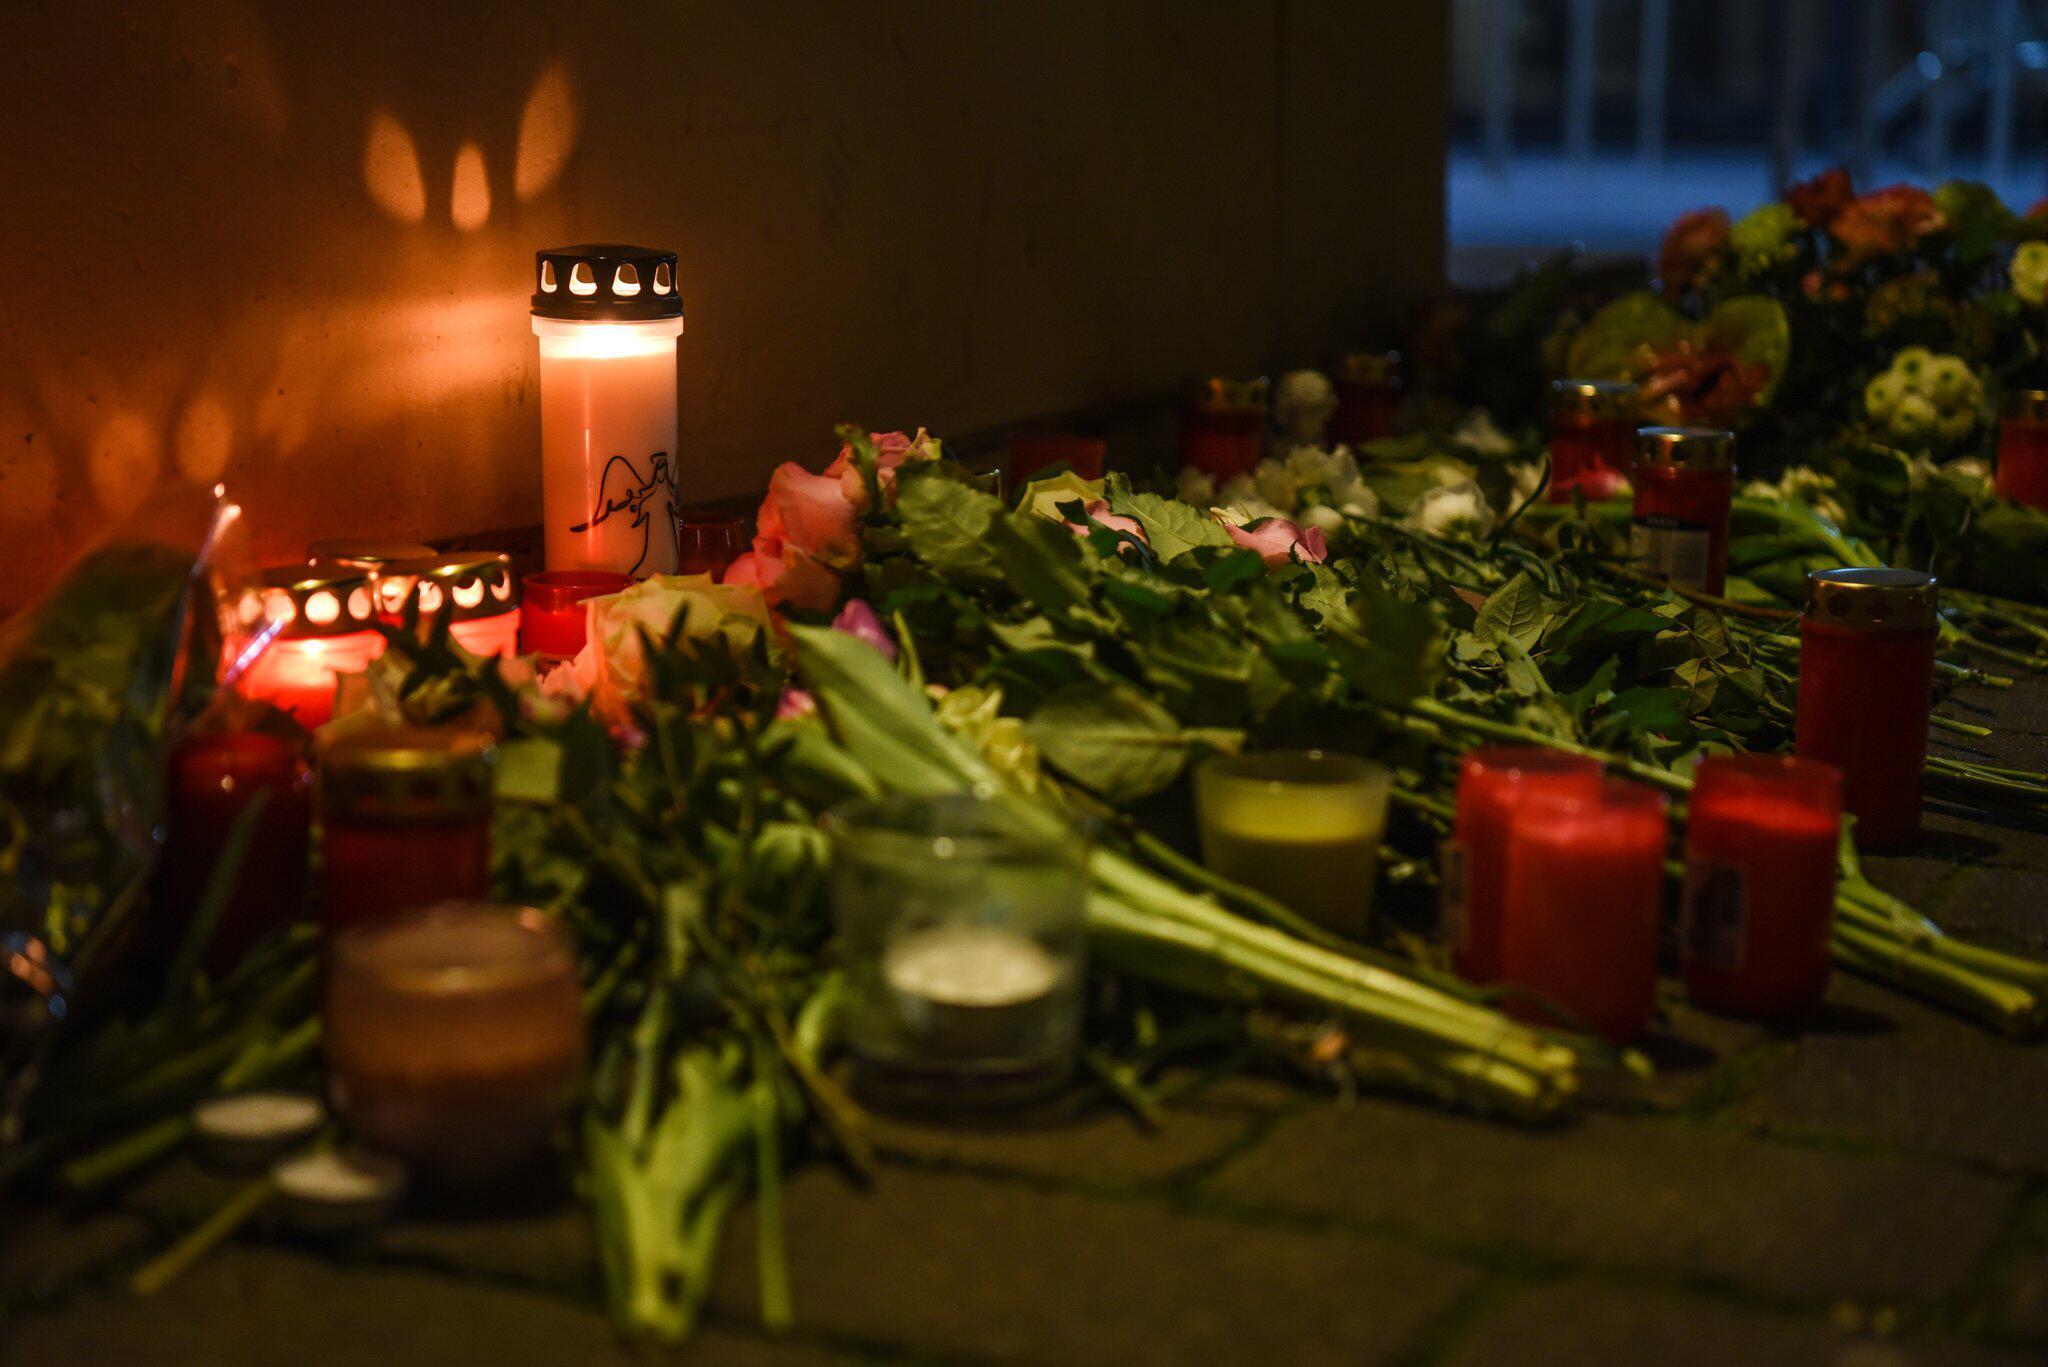 Bild zu After shots in Hanau - commemoration